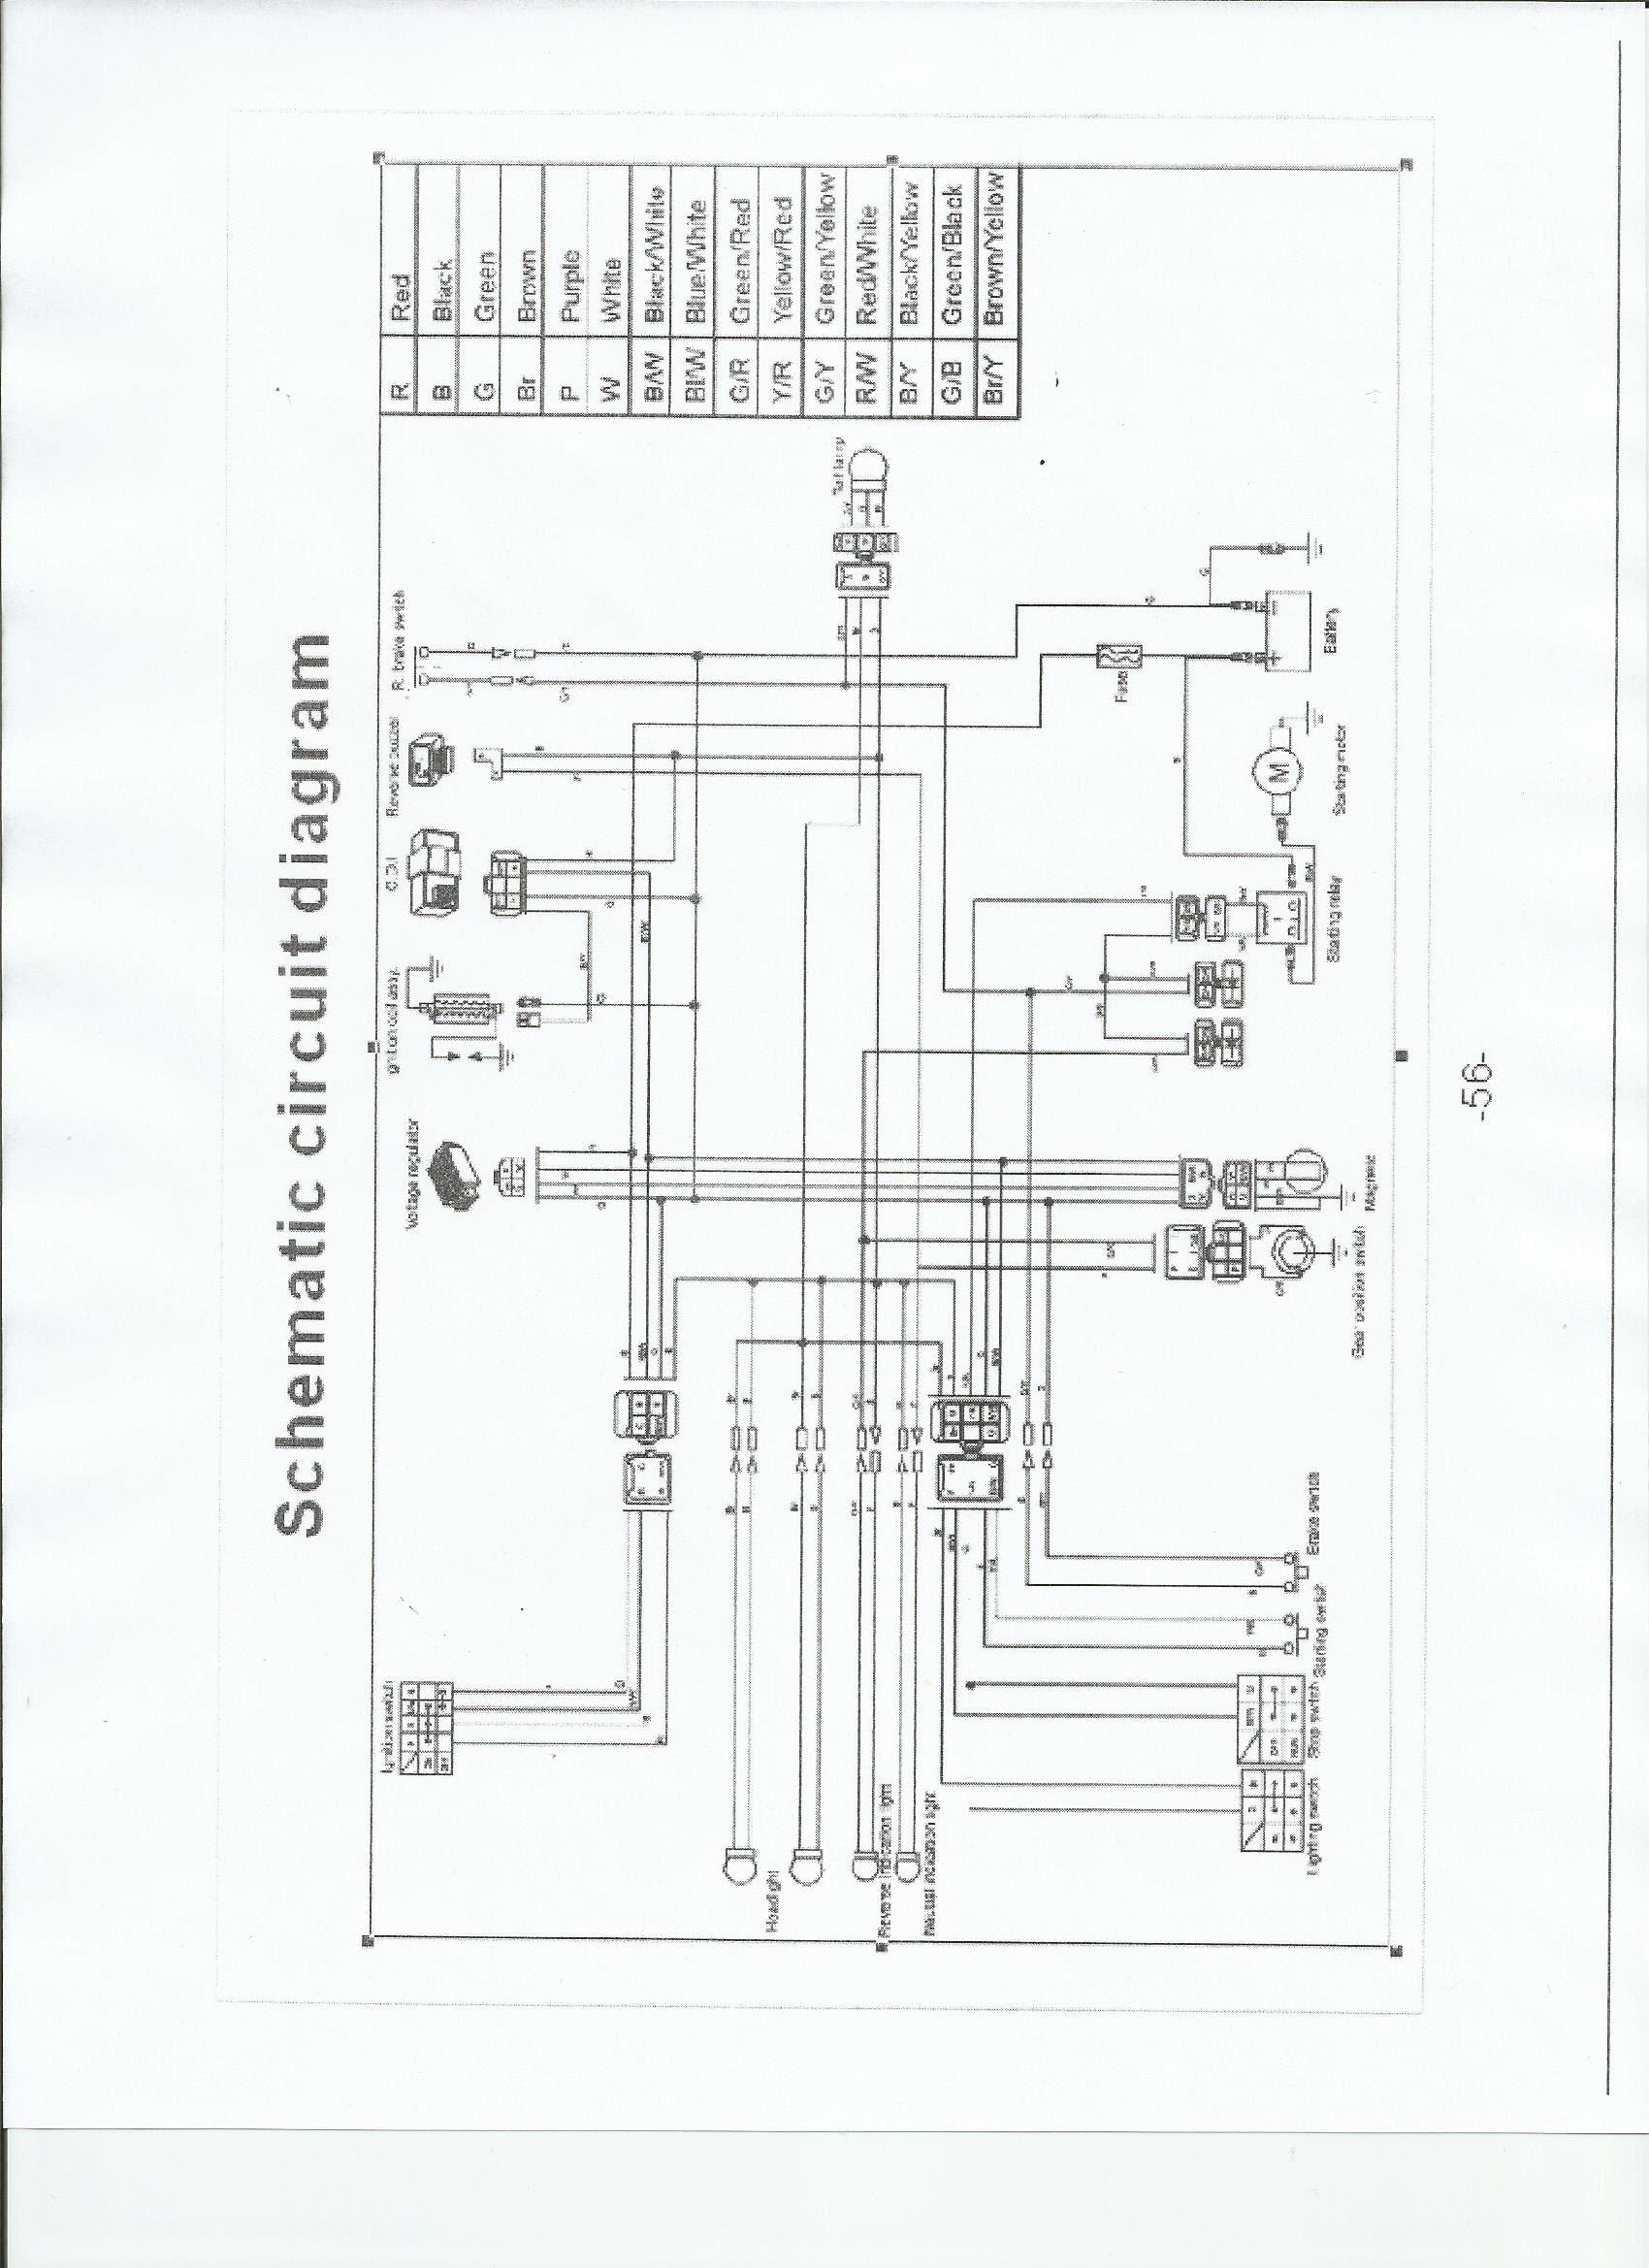 A42b37 Tao Tao Wiring Diagram Cdi Box Wiring Resources